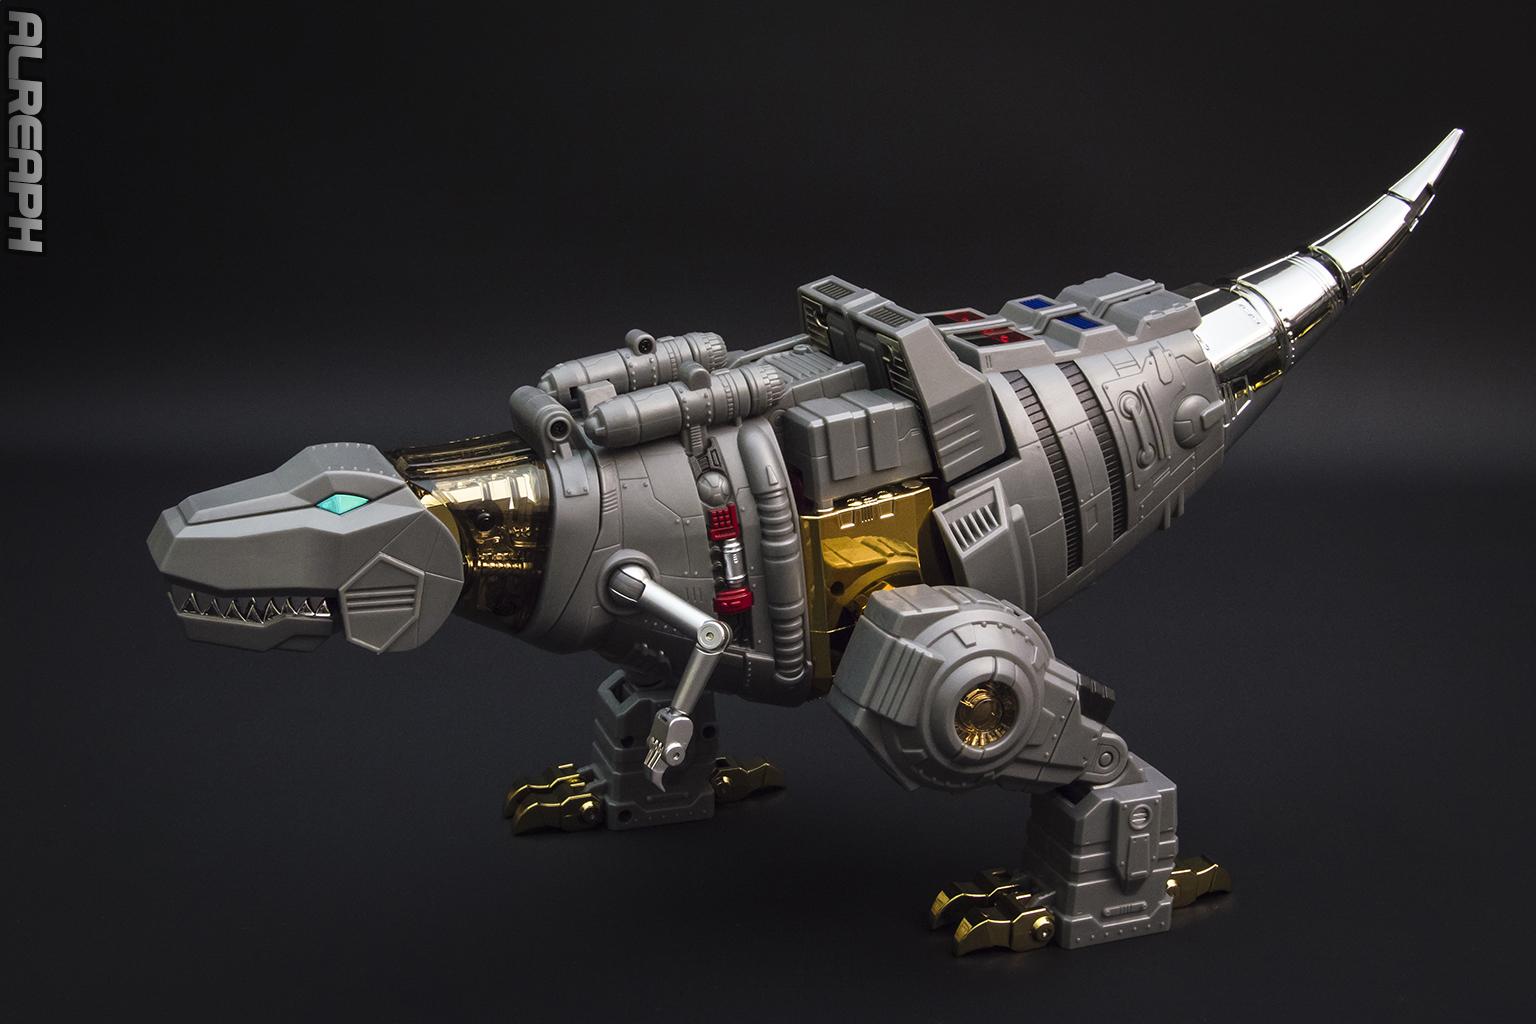 [Fanstoys] Produit Tiers - Dinobots - FT-04 Scoria, FT-05 Soar, FT-06 Sever, FT-07 Stomp, FT-08 Grinder - Page 12 HAXfwk3k